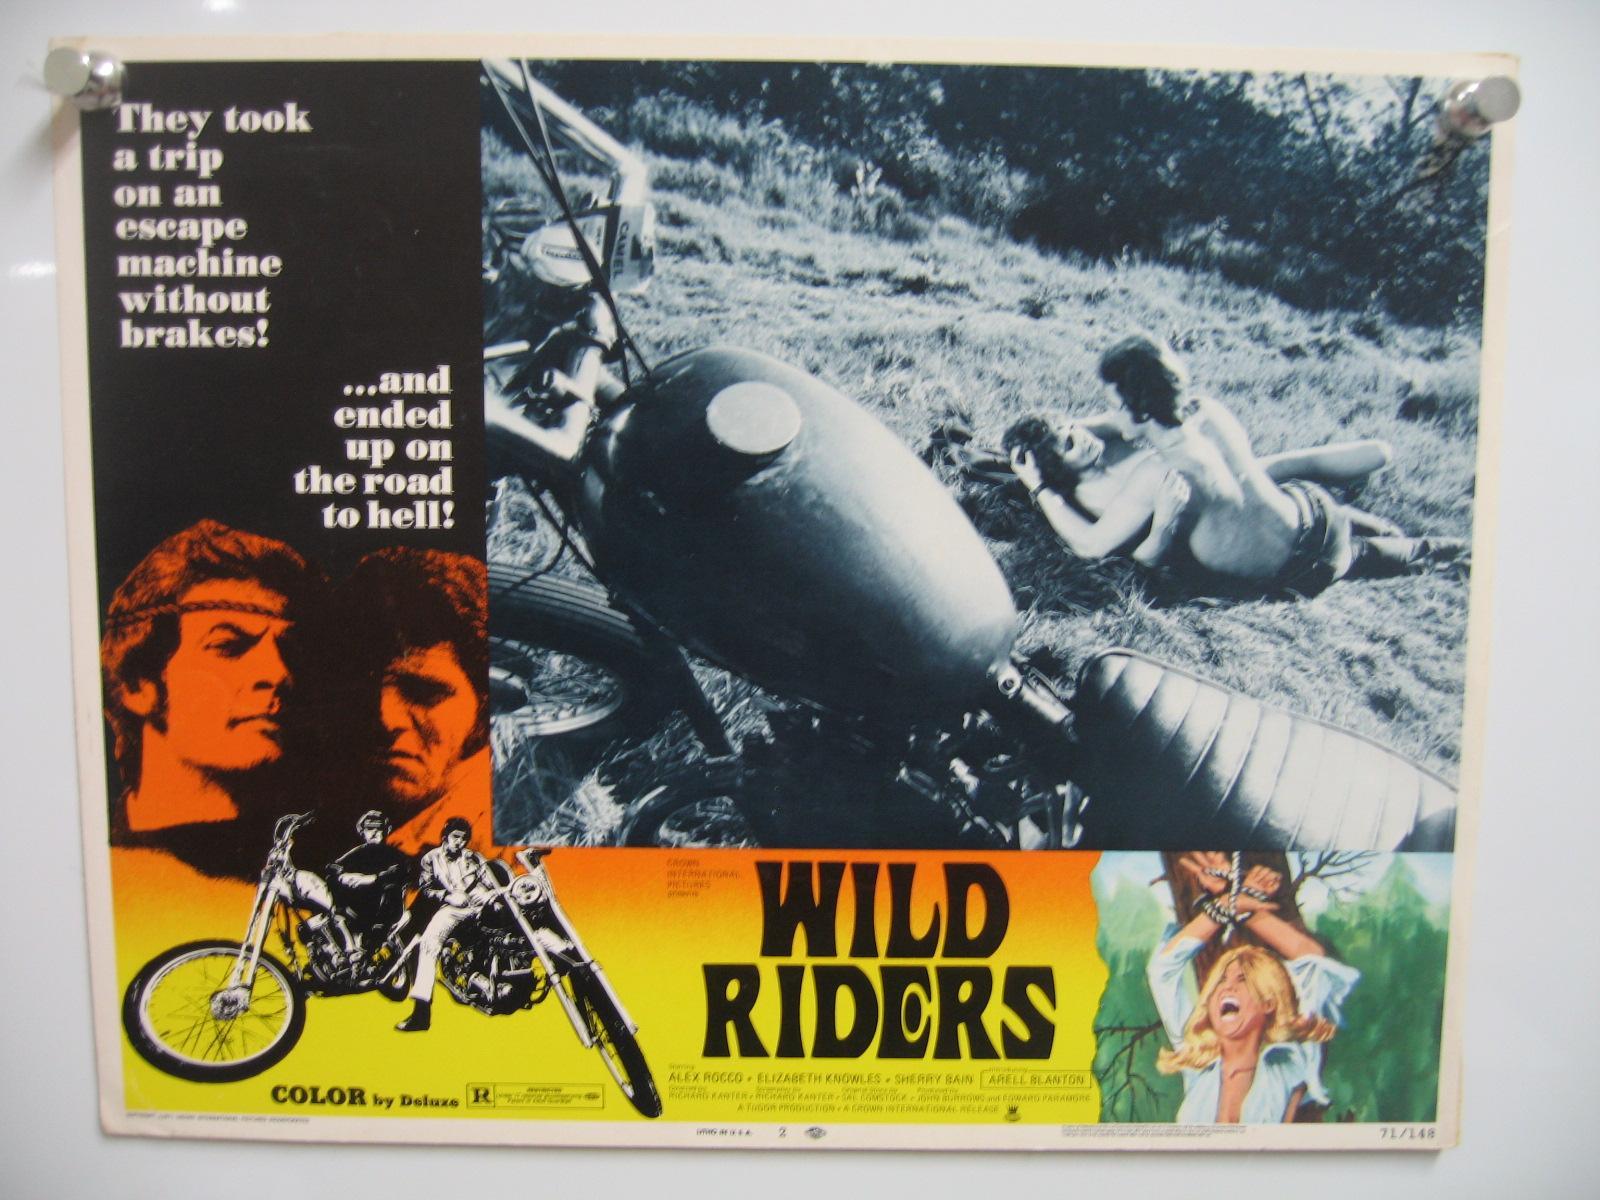 WILD RIDERS-#2-1971-ROMANCE SCENE NEXT TO MOTORCYCLE VG Very Good